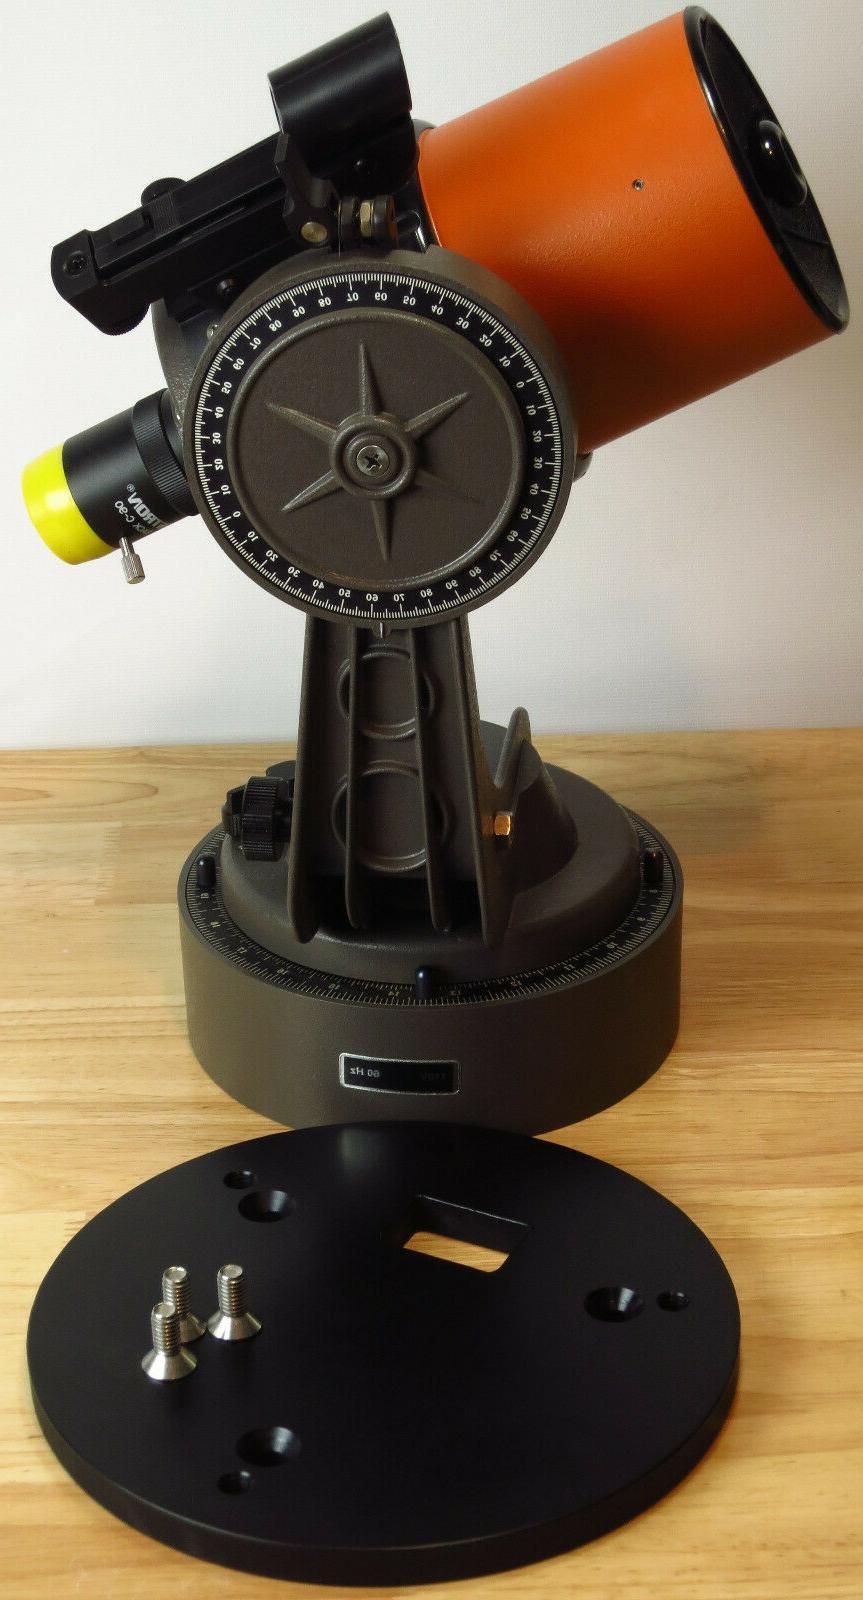 celestron c90 astro telescope wedge adapter plate